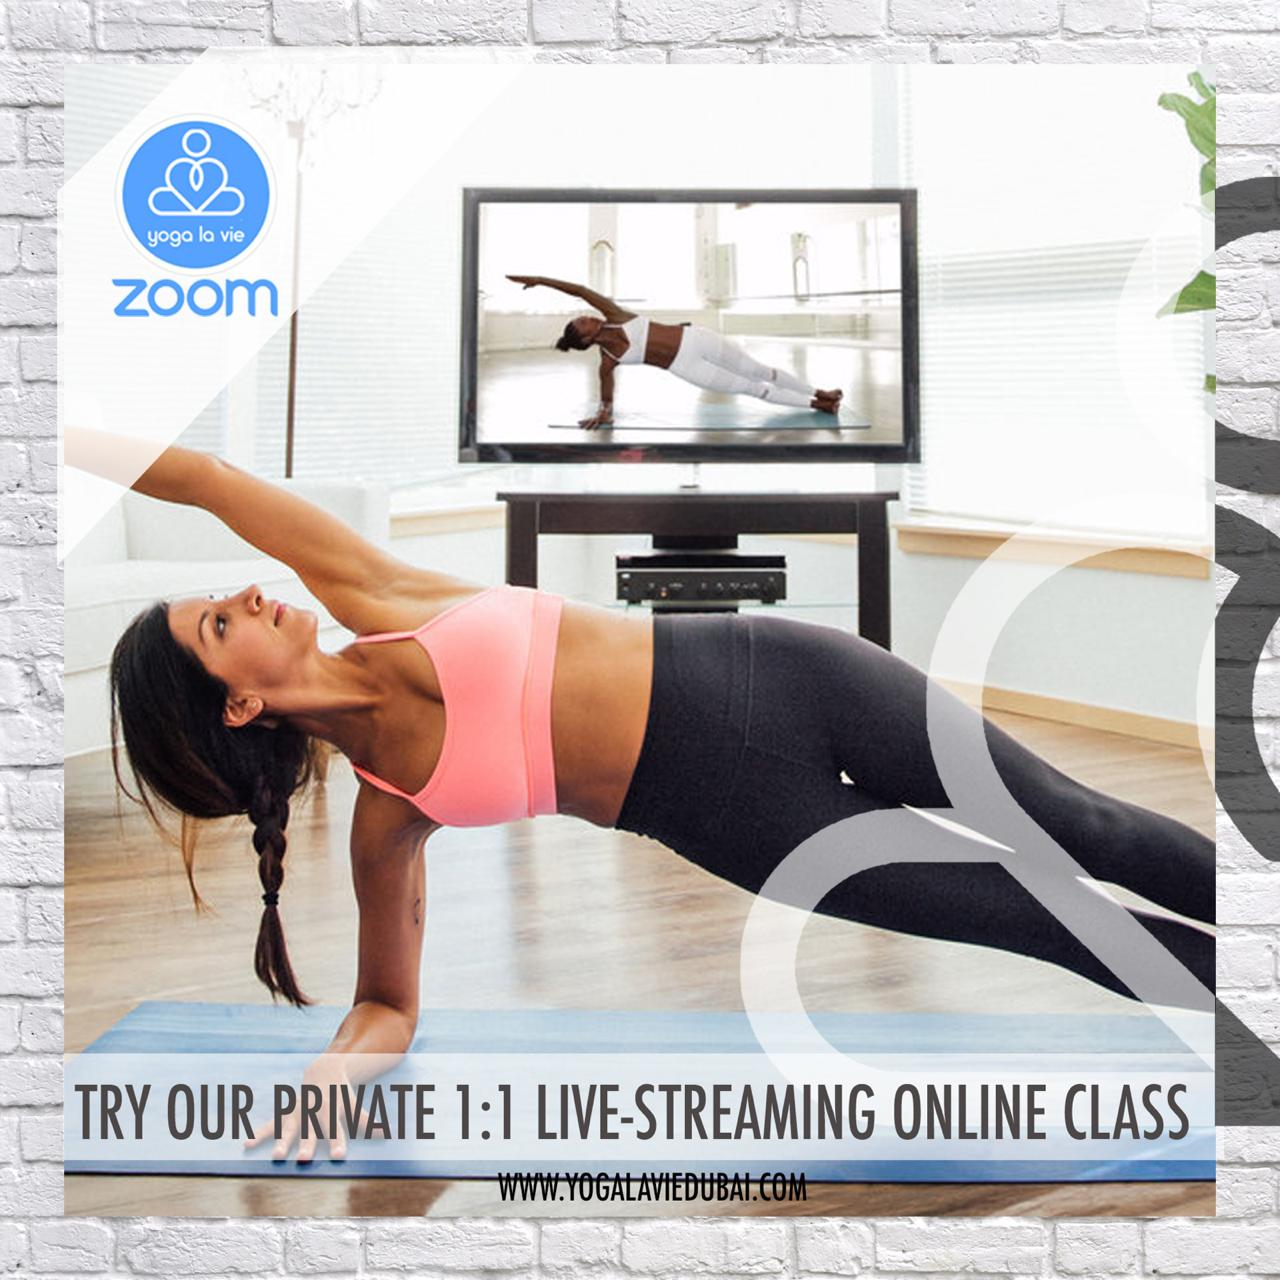 yogalaviedubai - 3 private classes packages